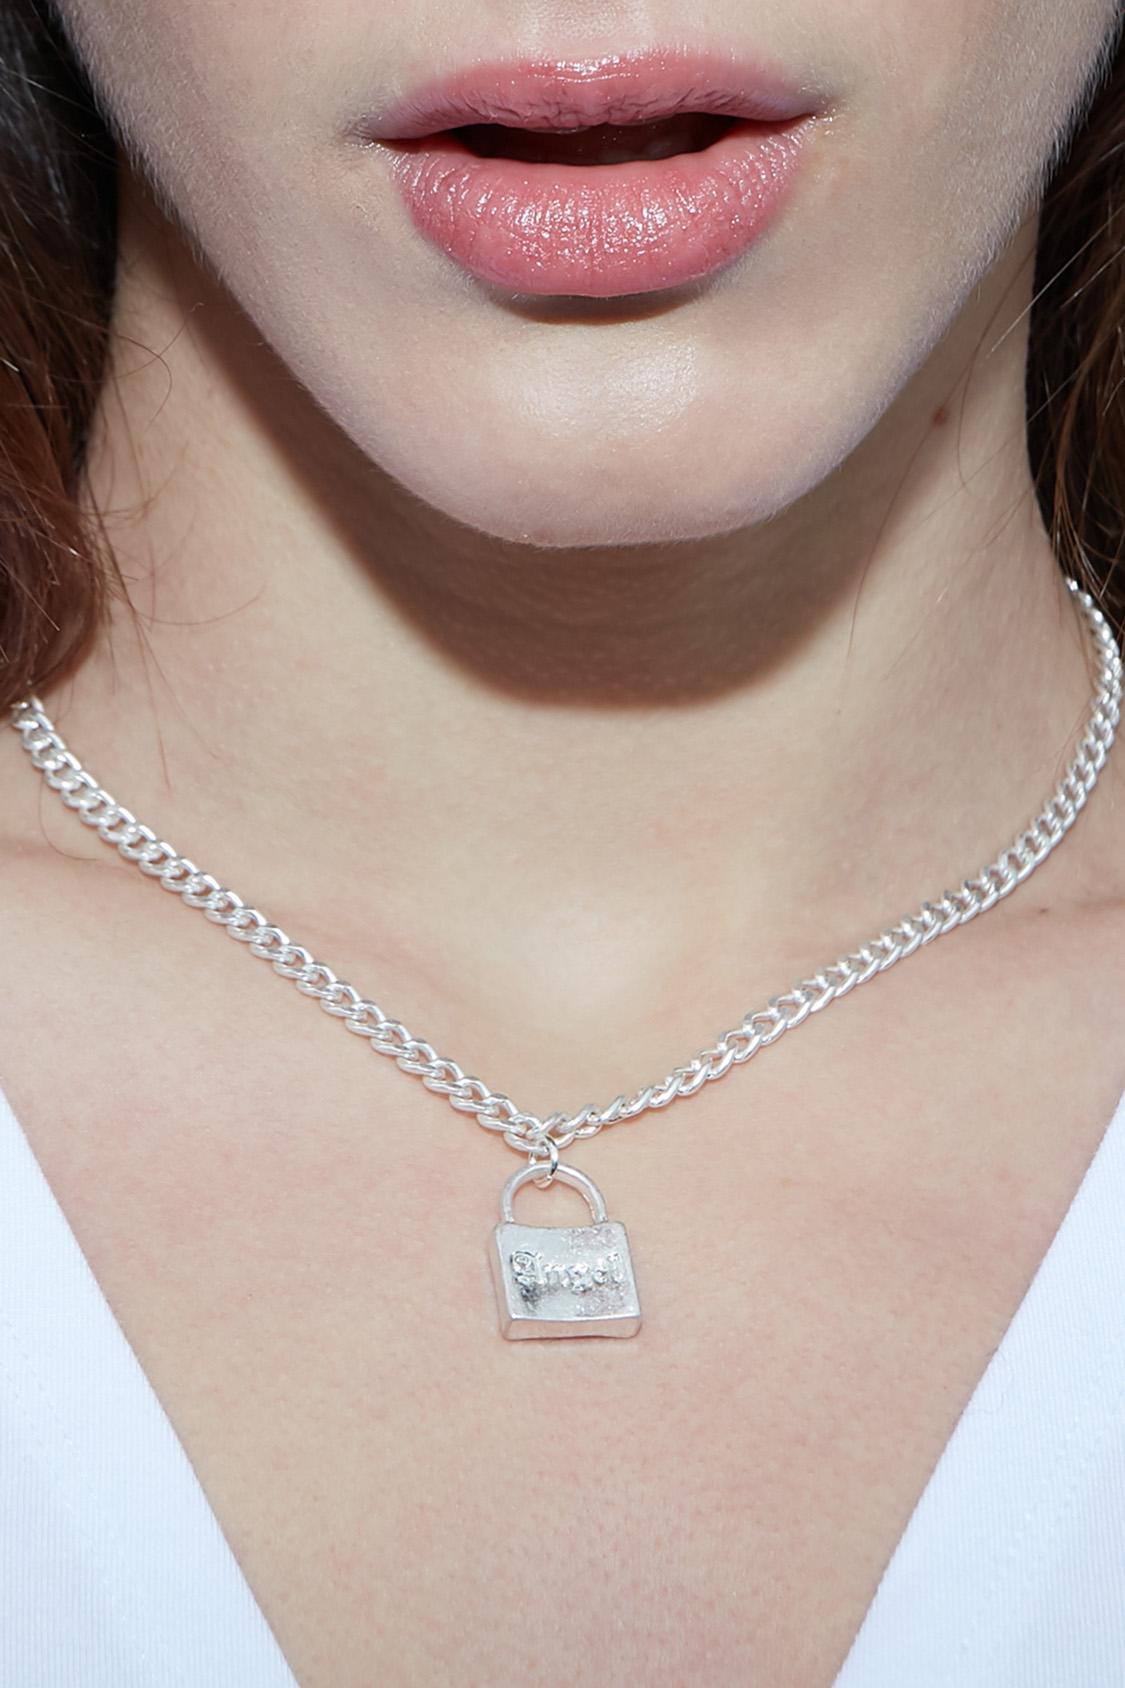 Angel padlock necklace